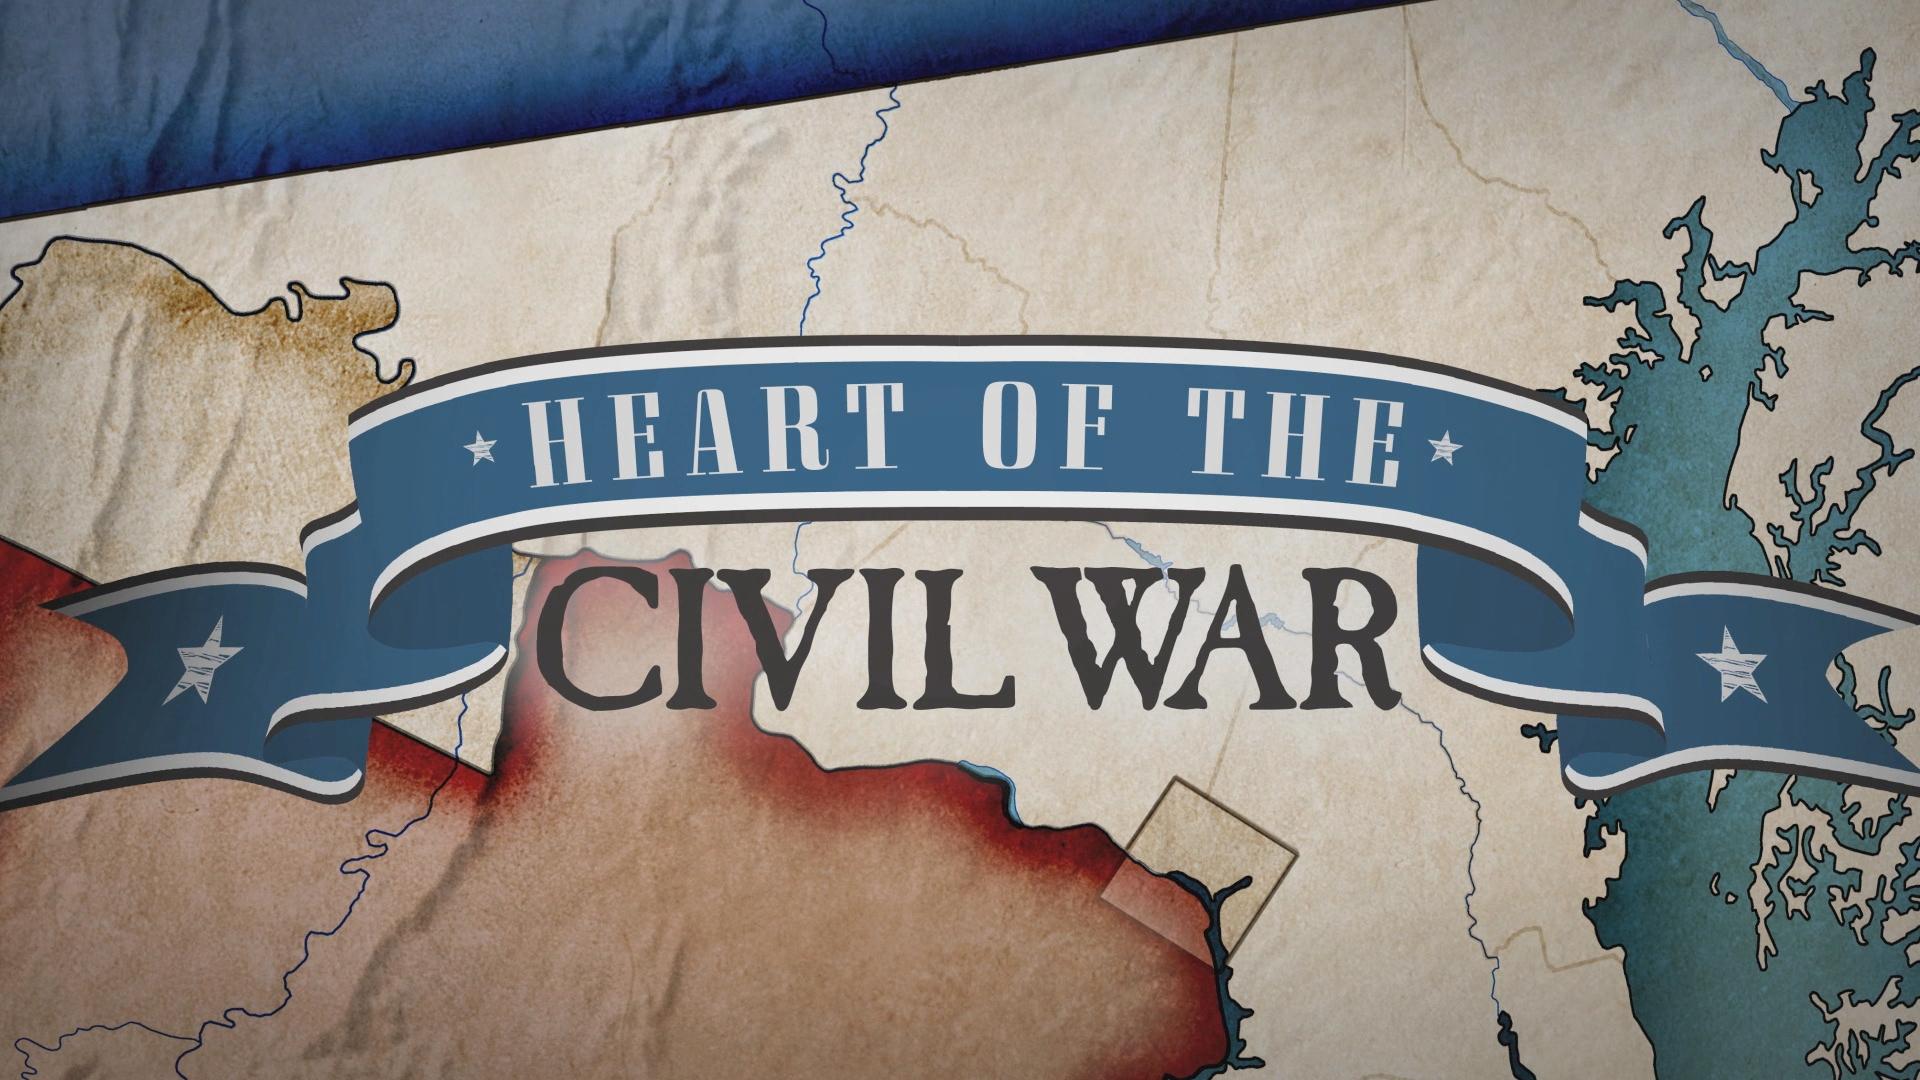 American Civil War Wallpaper Border Heart of the civil war logo 1920x1080